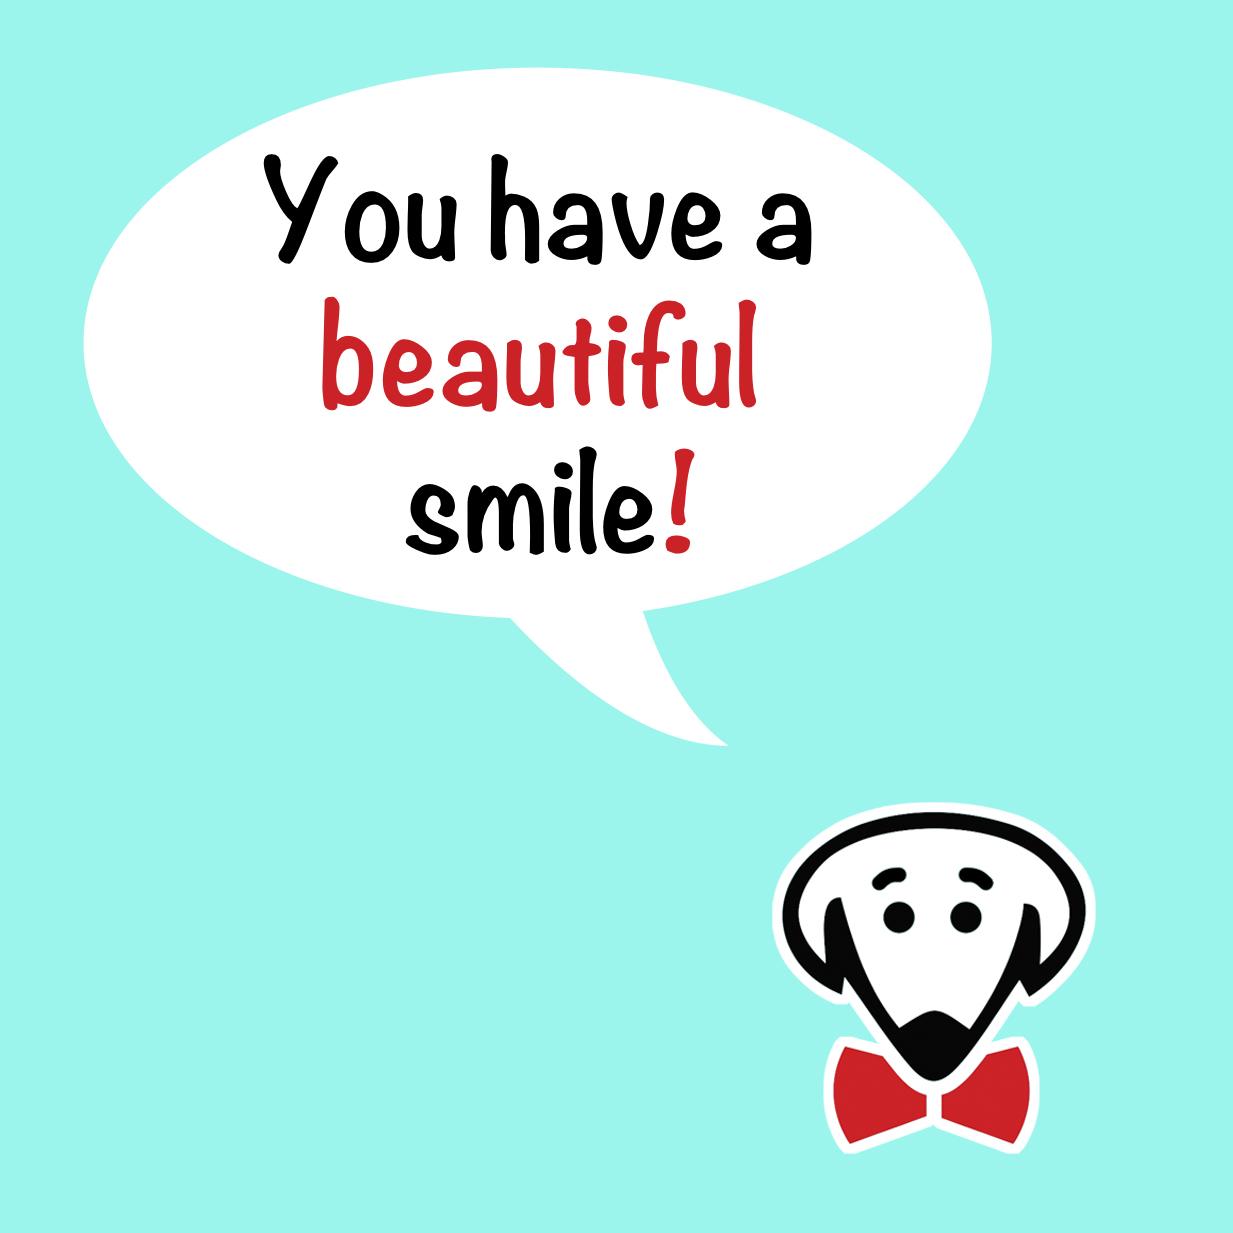 You have a beautiful smile! Use it., etc. – coaster set